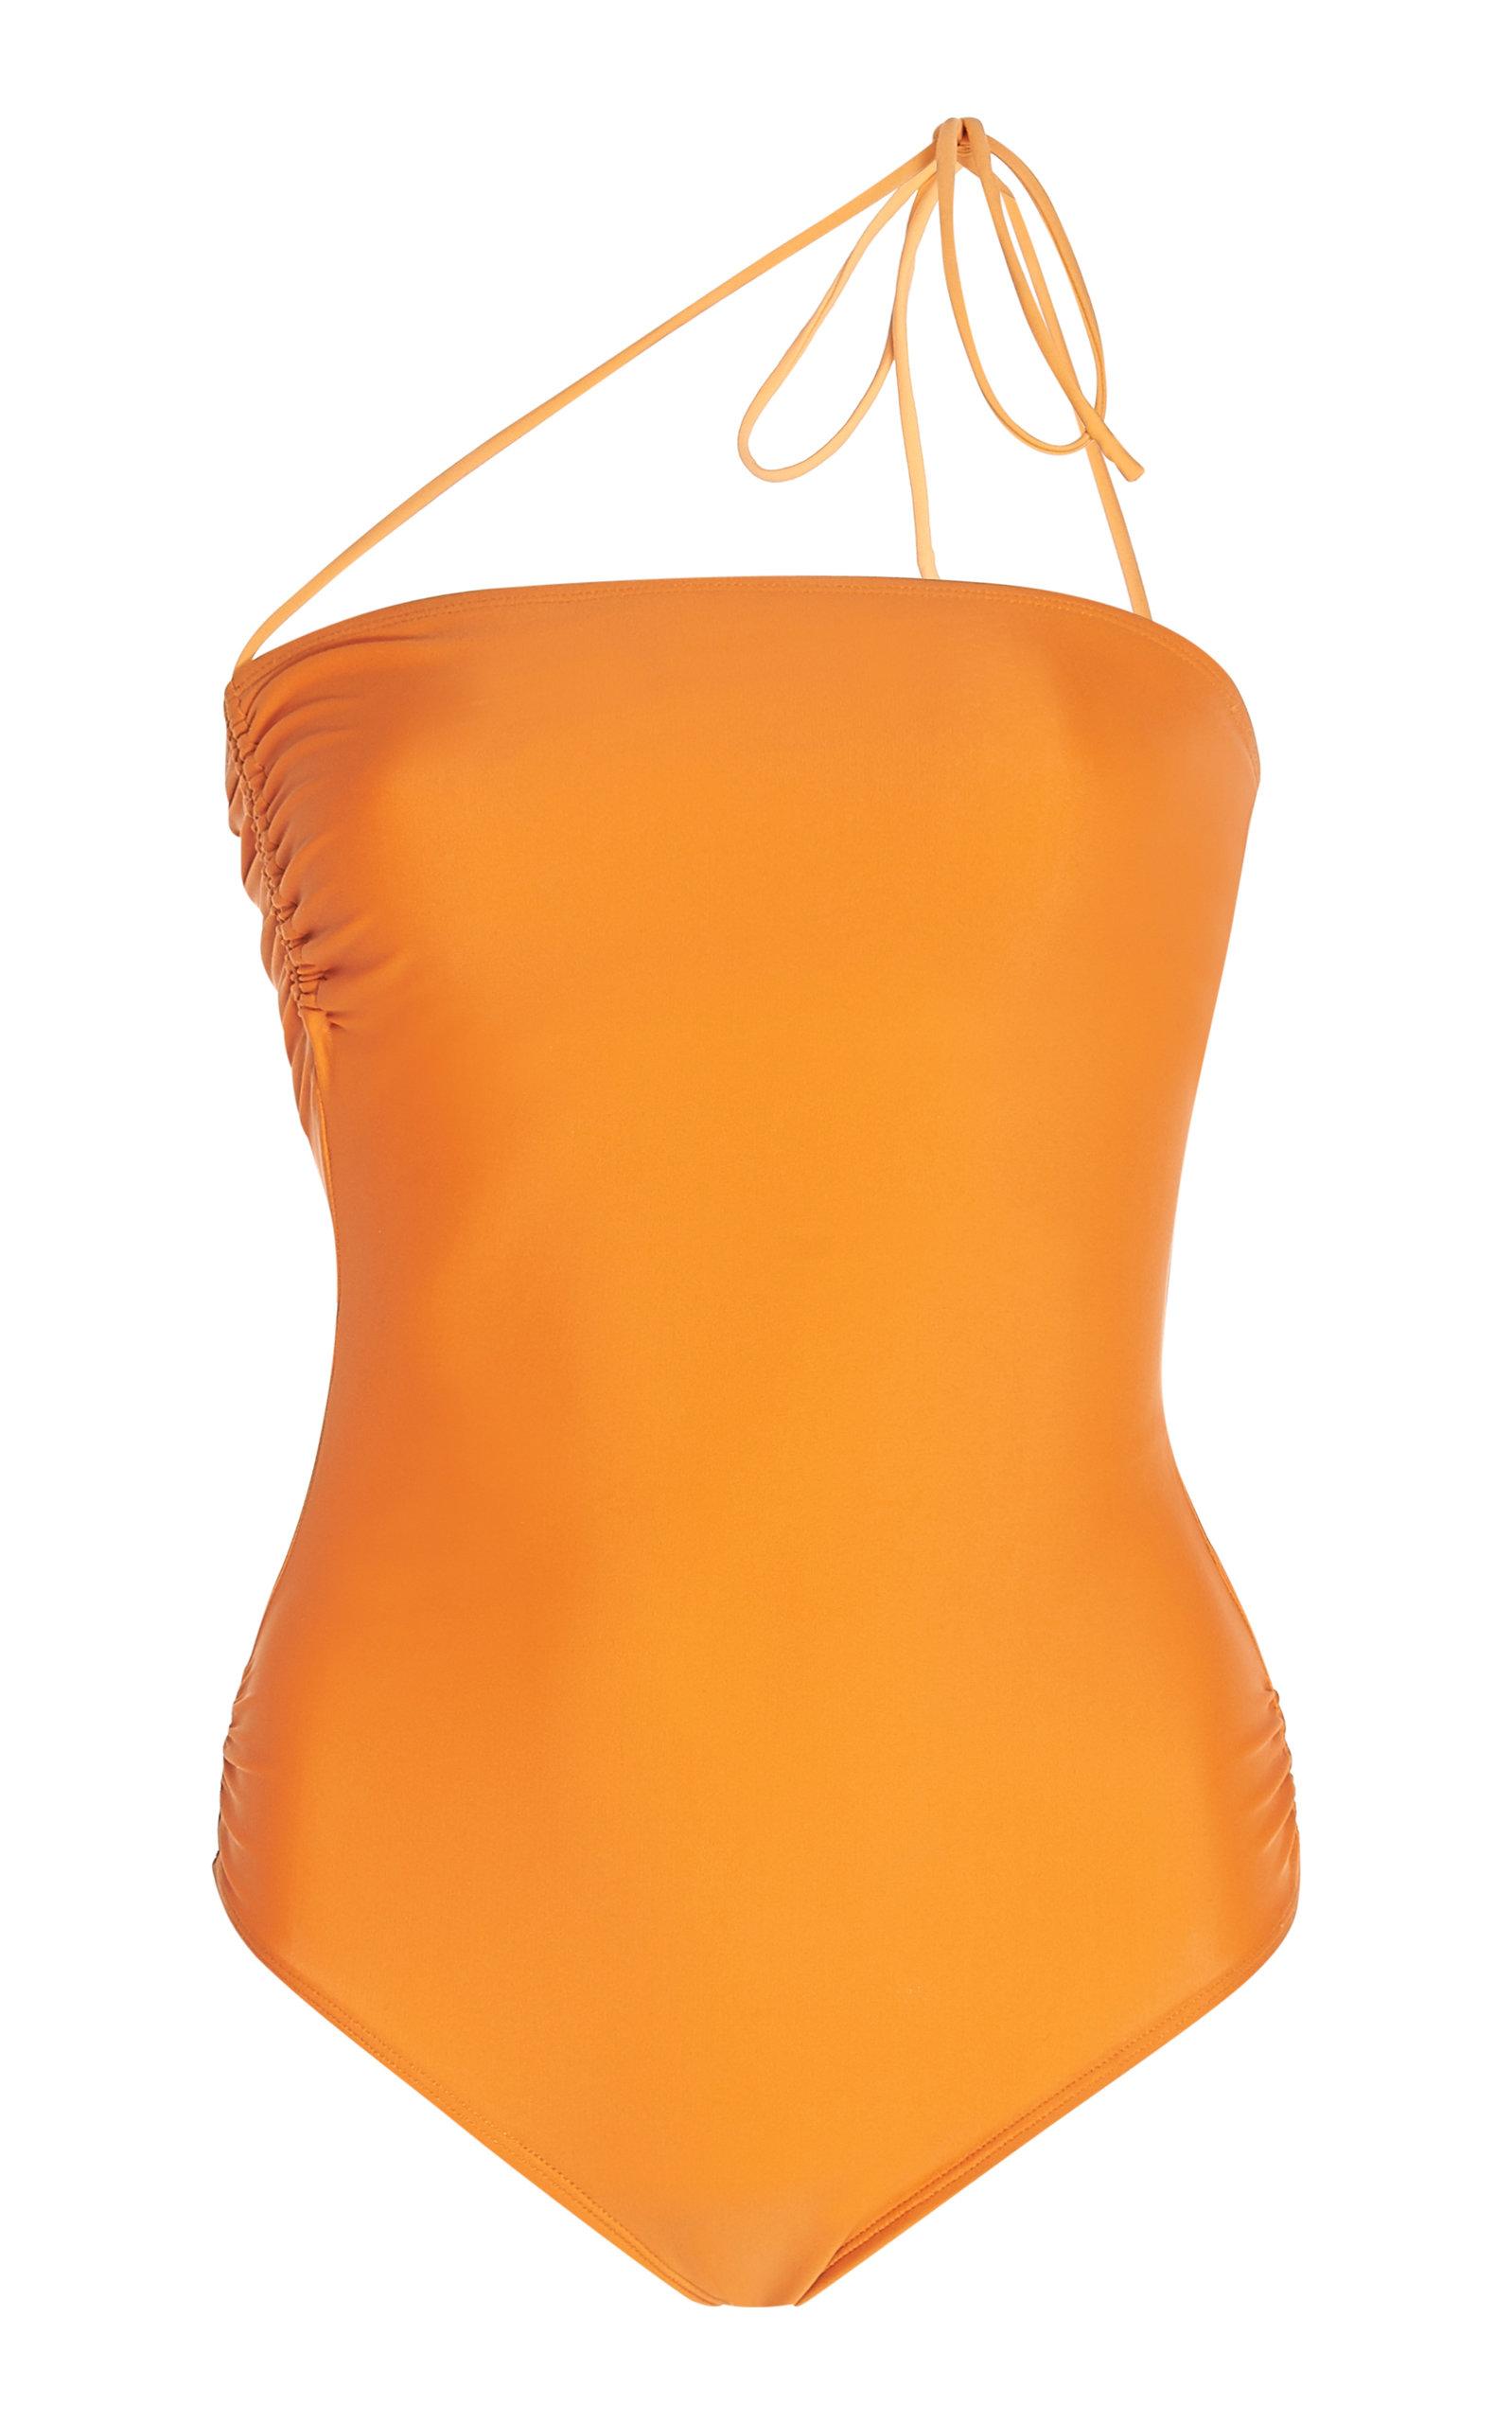 892c4ca0e5d234 New Swimsuit Trends 2019 Cool Bikini, One-Piece Styles